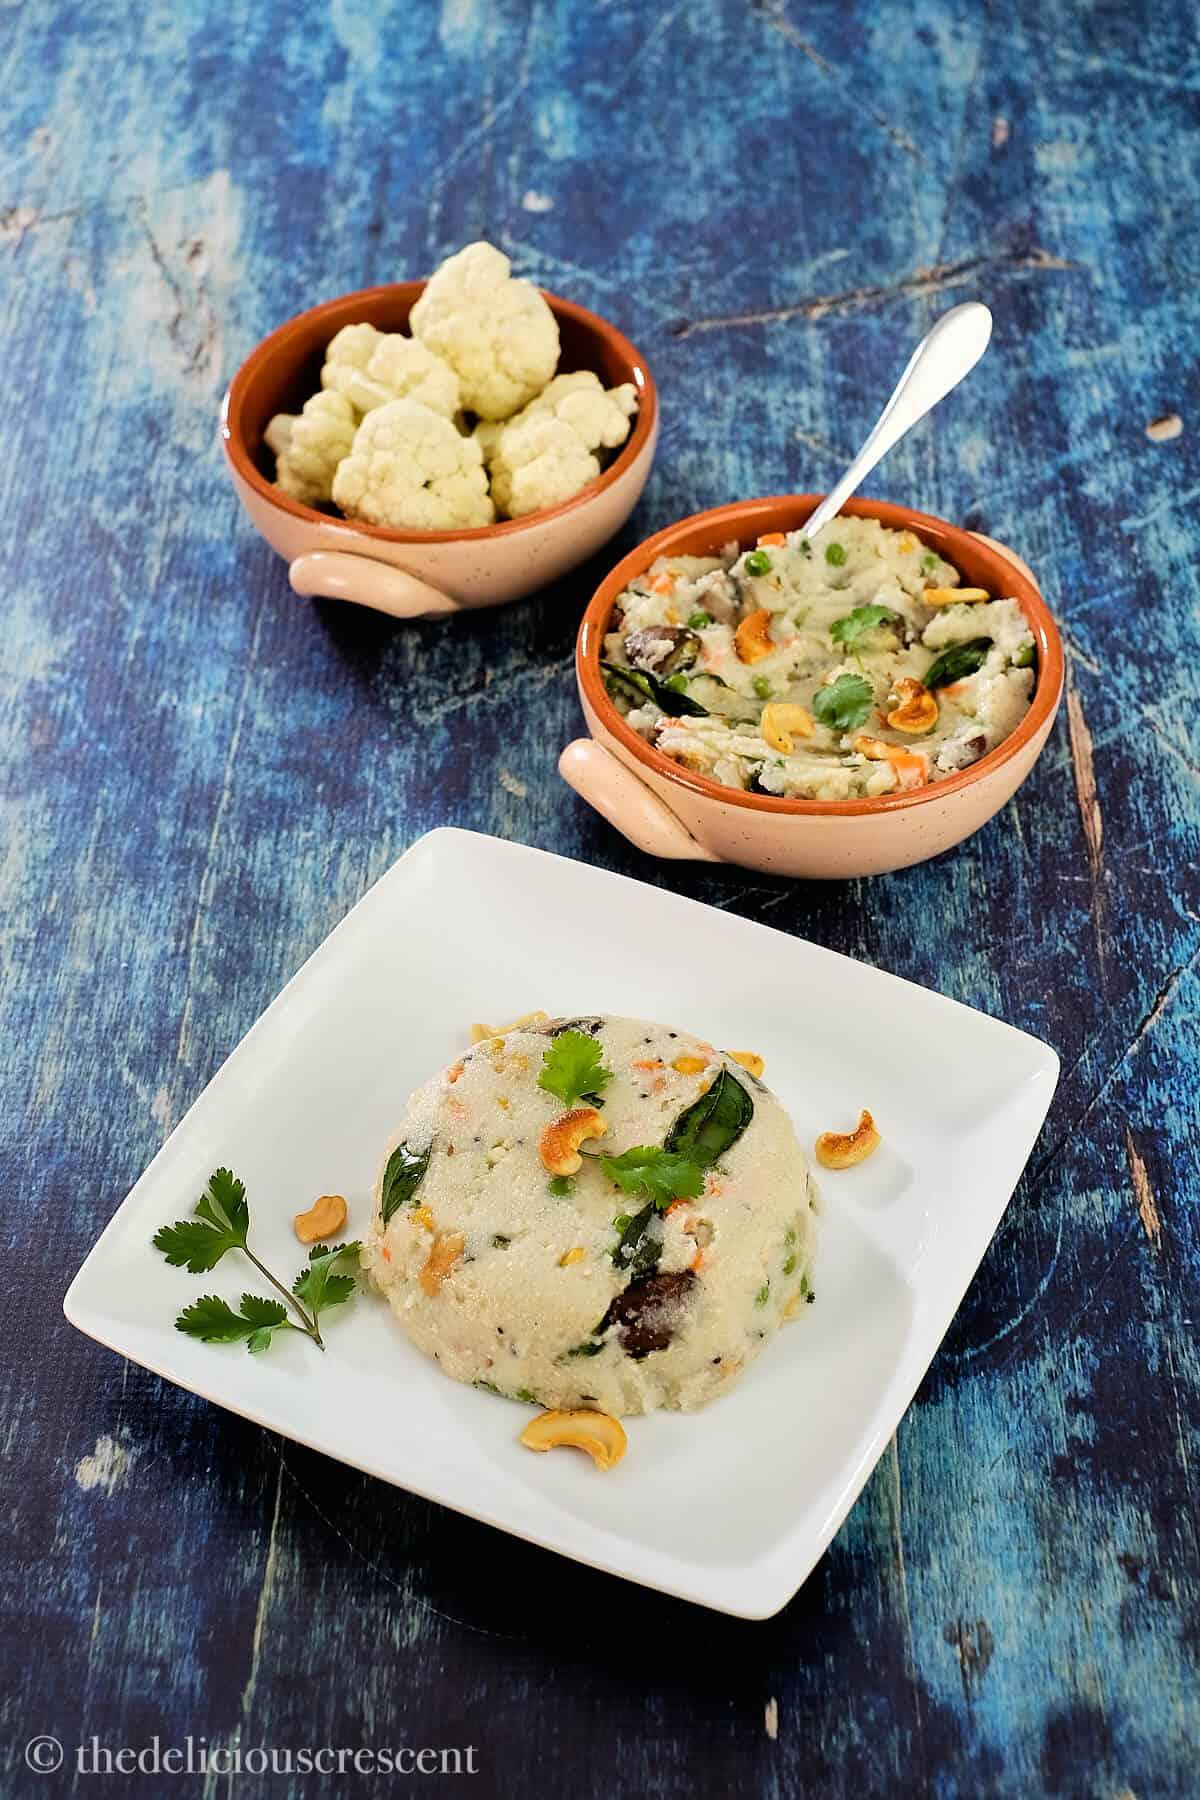 Indian savory semolina porridge in a plate.